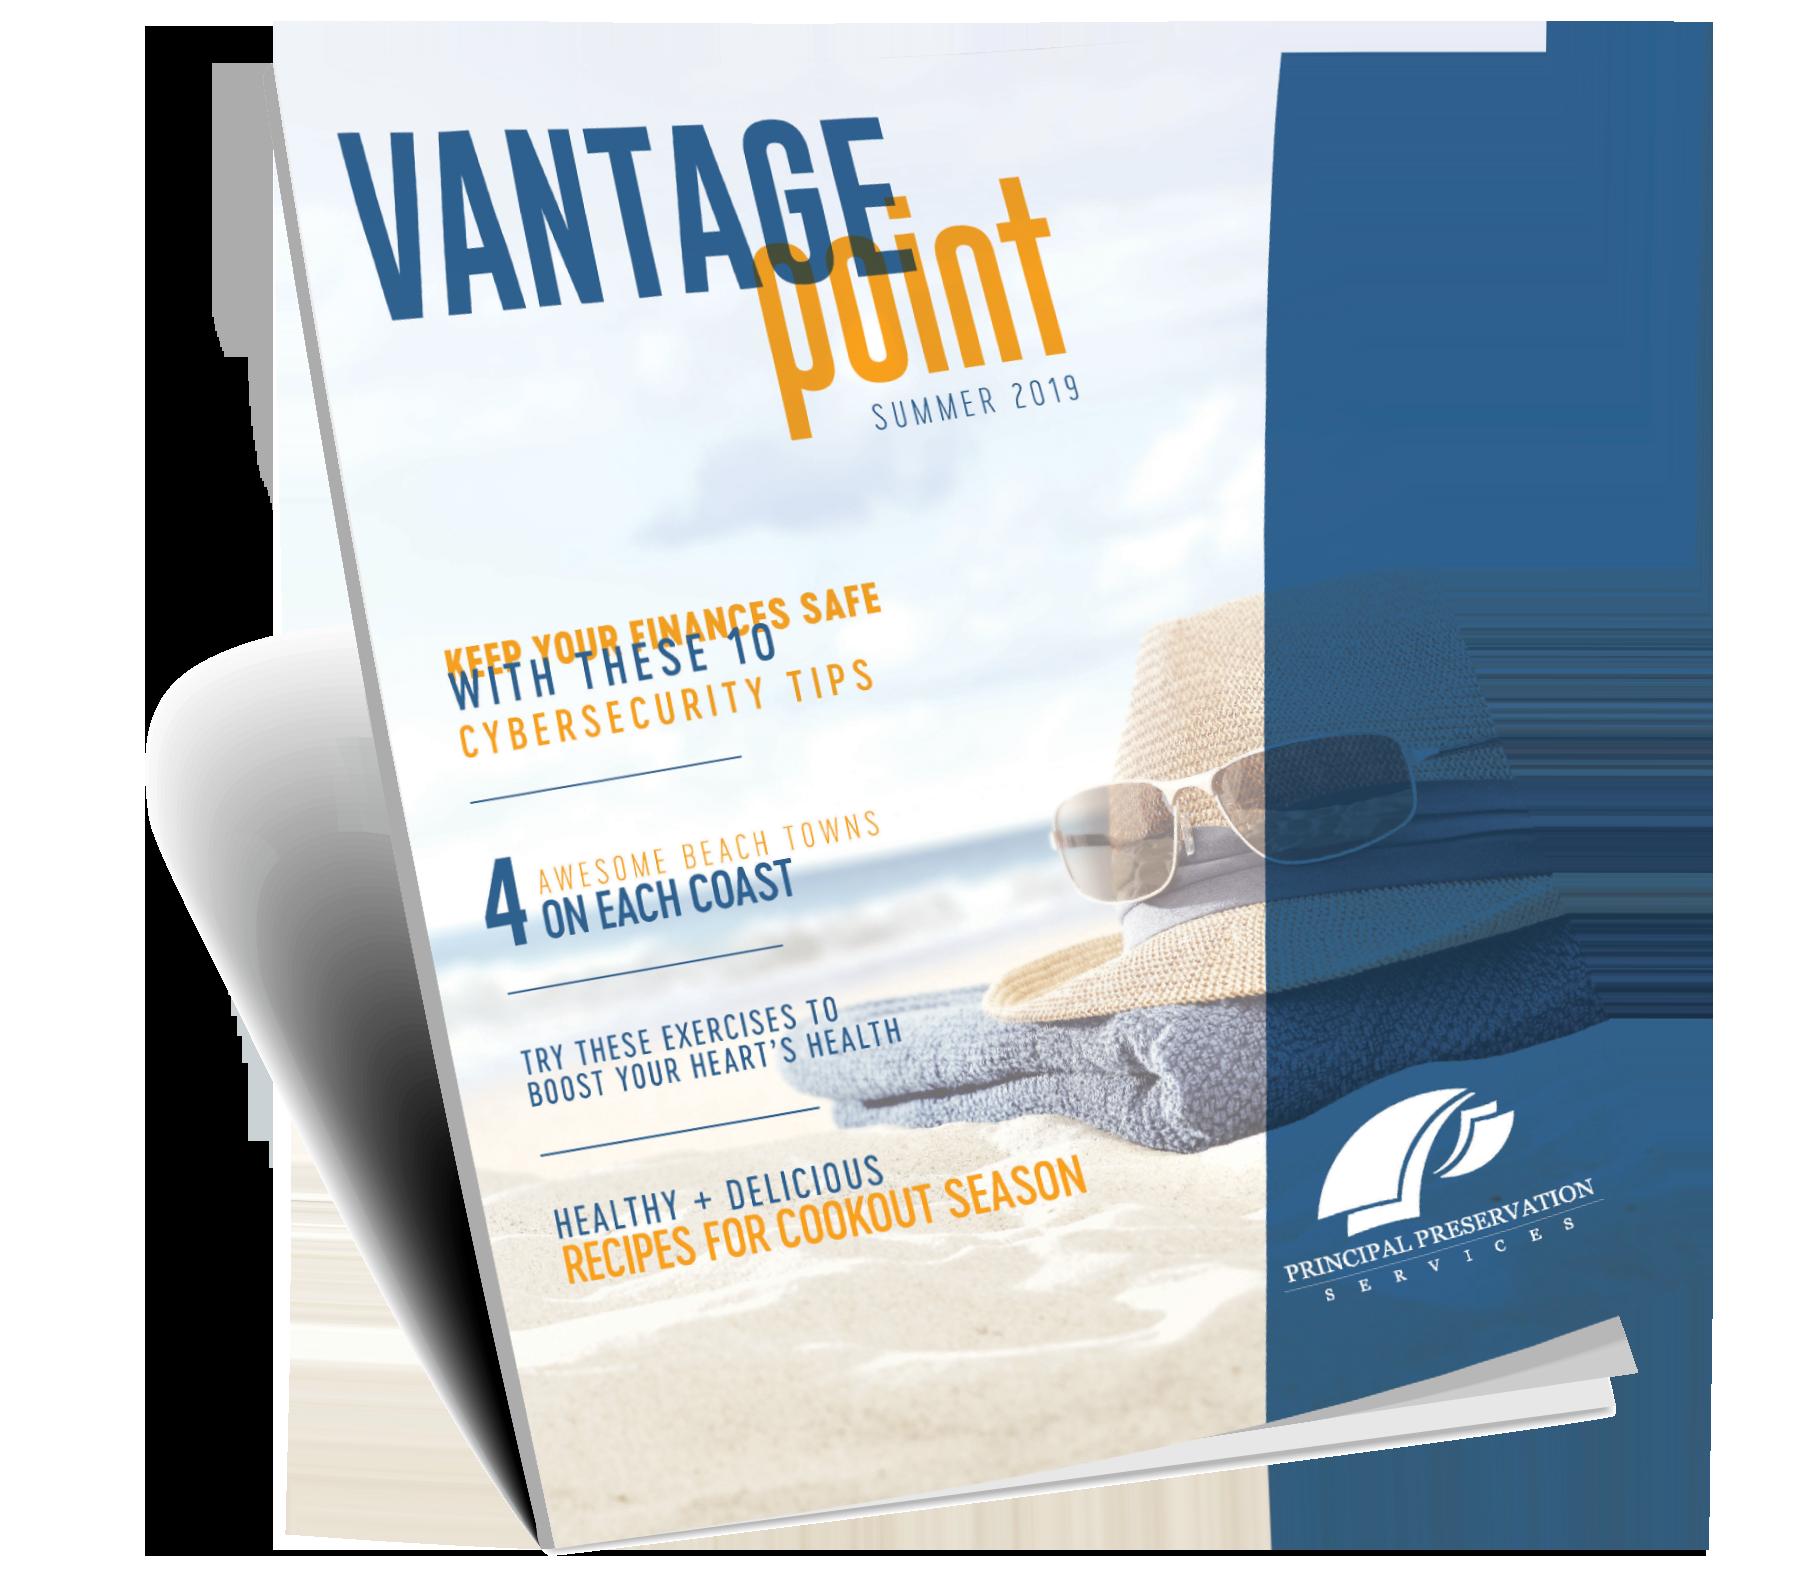 Summer 2019 Newsletter – Vantage Point – Principal